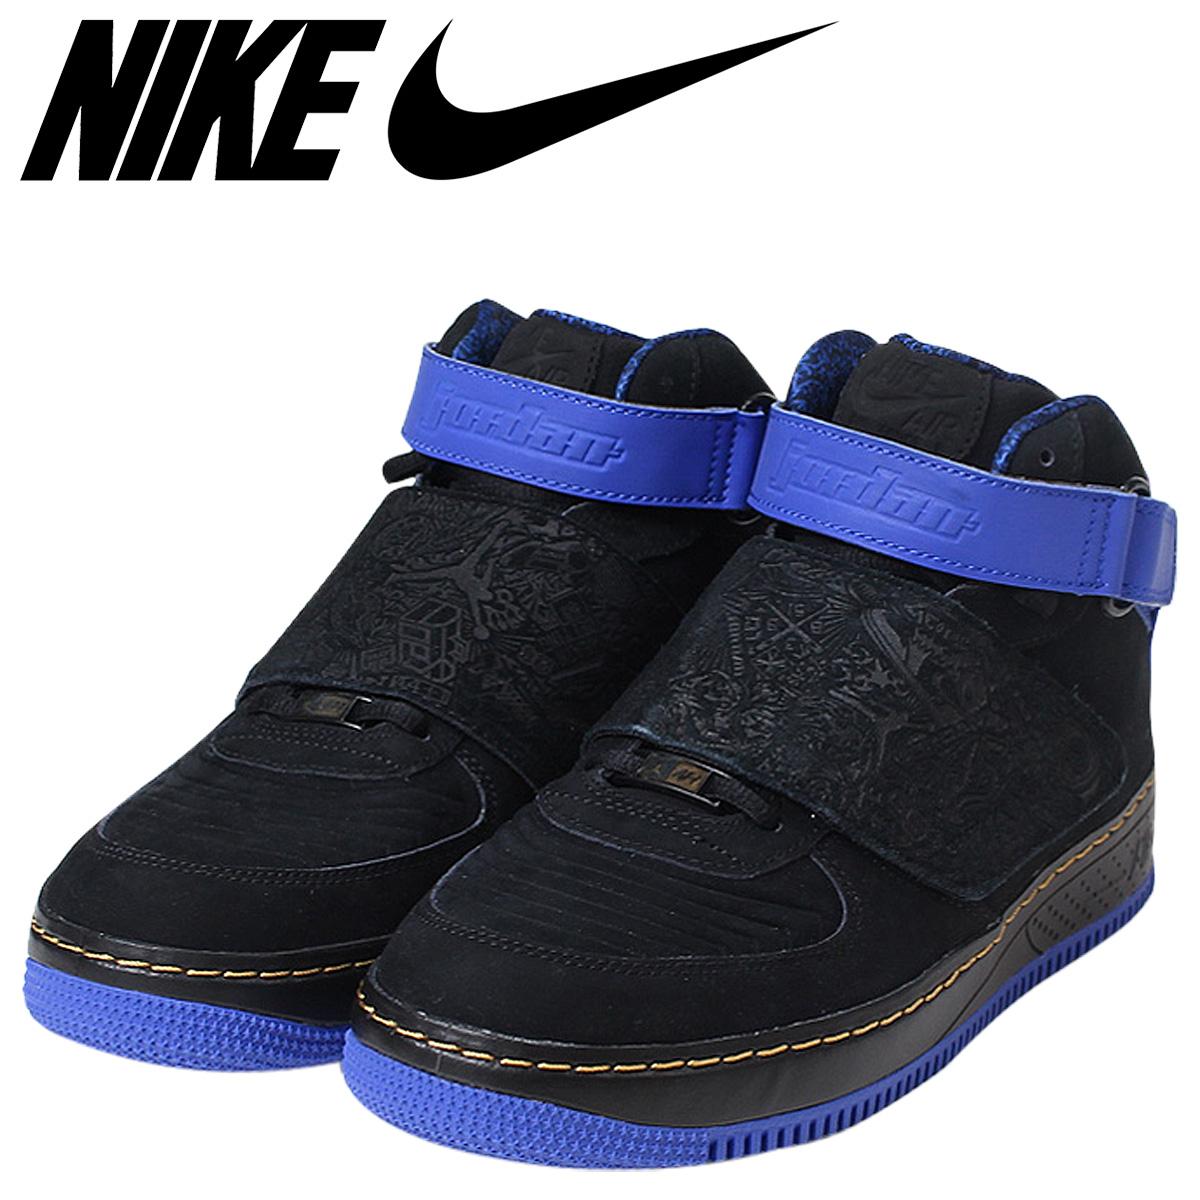 d331979b73ed Whats up Sports  Nike NIKE Air Jordan force fusion AJF20 sneakers ...